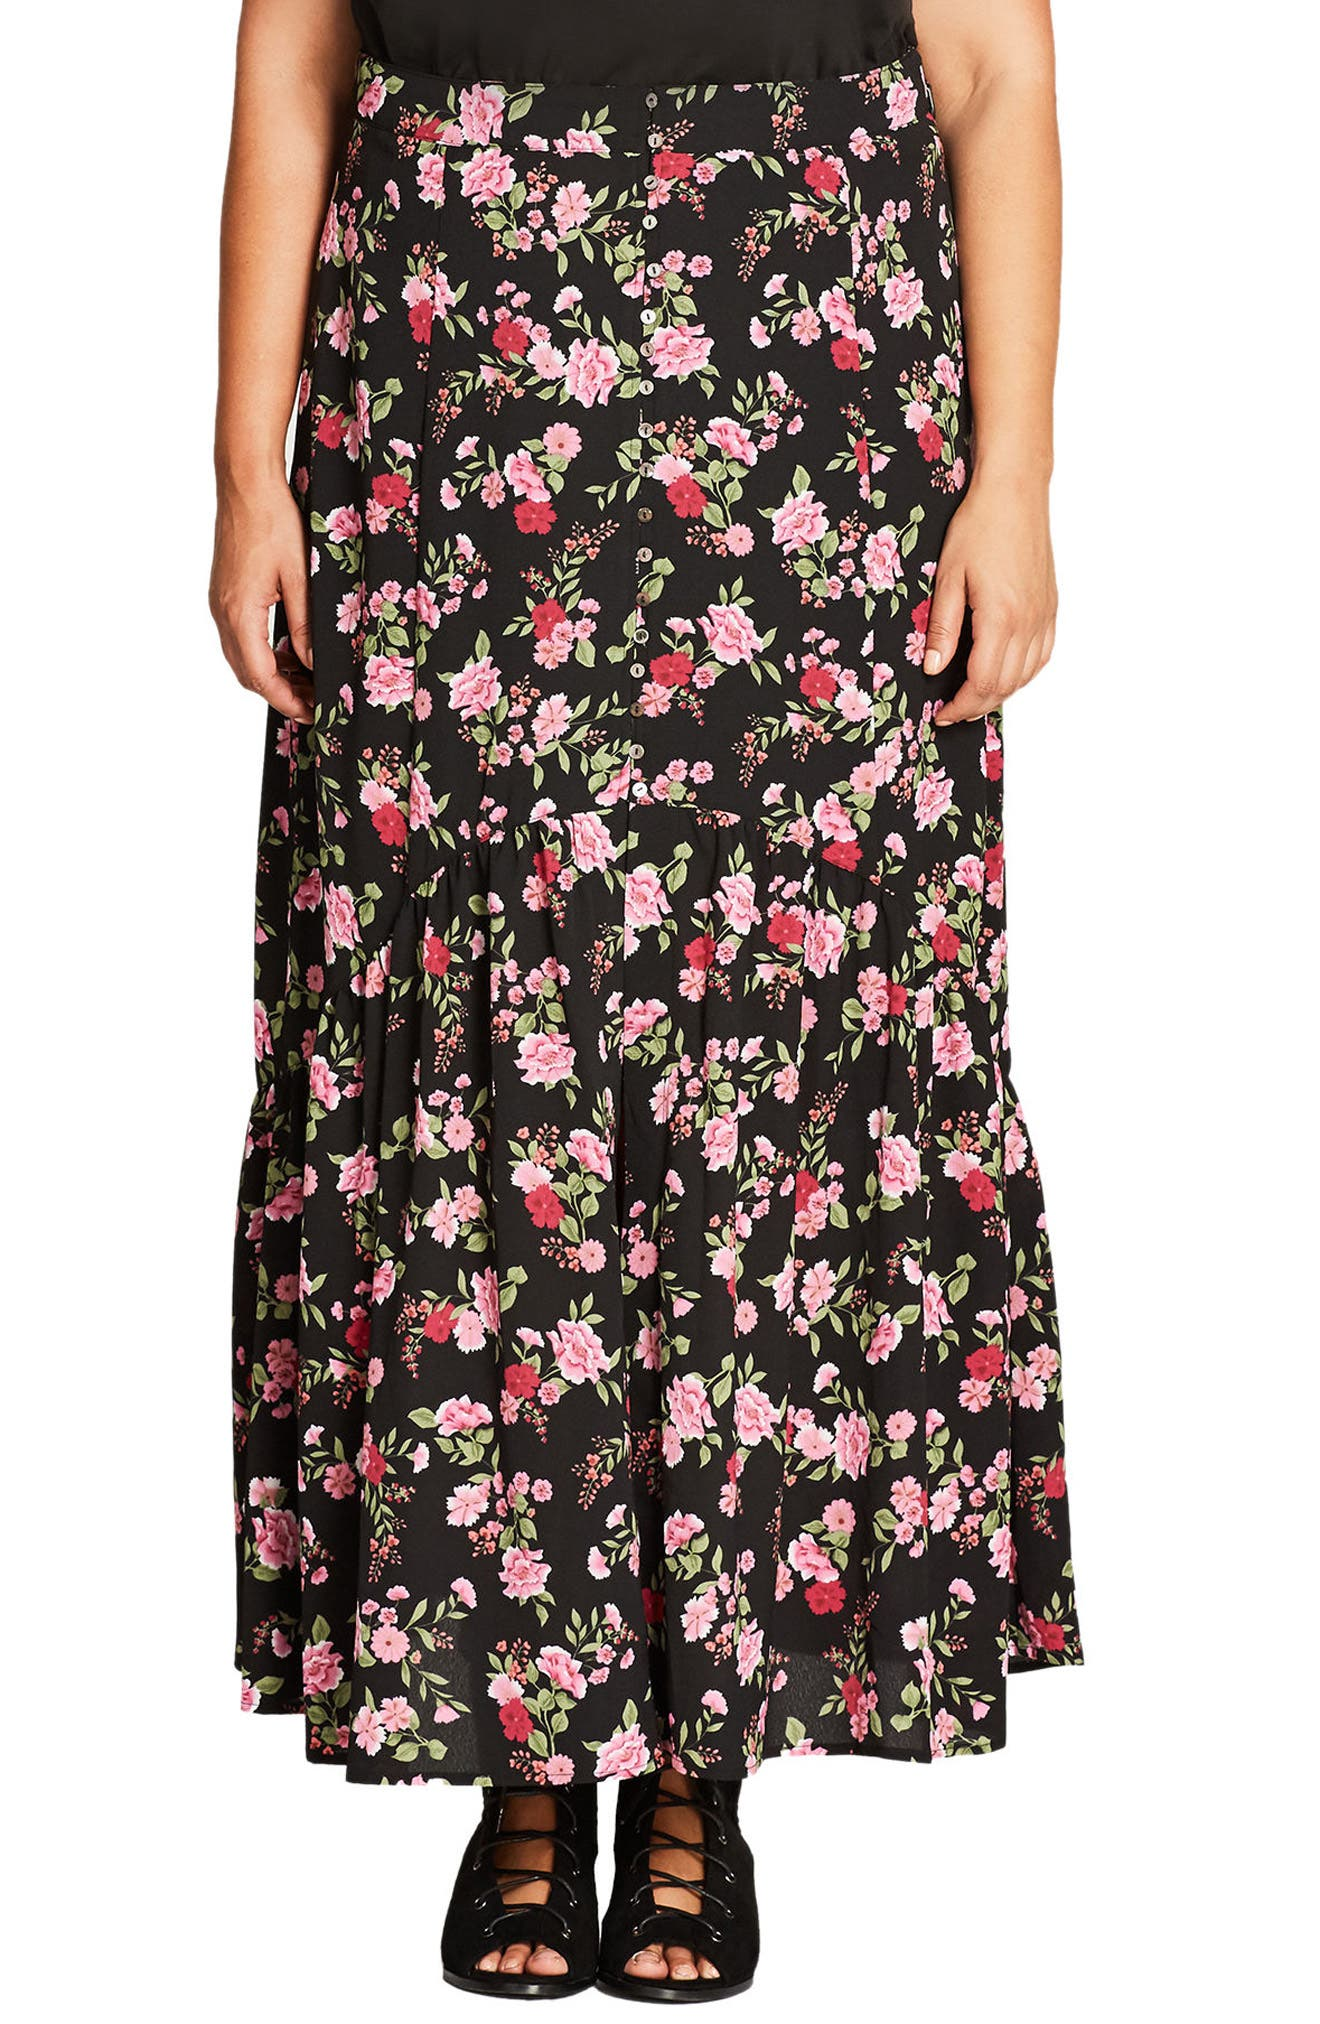 Free Spirit Maxi Skirt,                         Main,                         color, 602